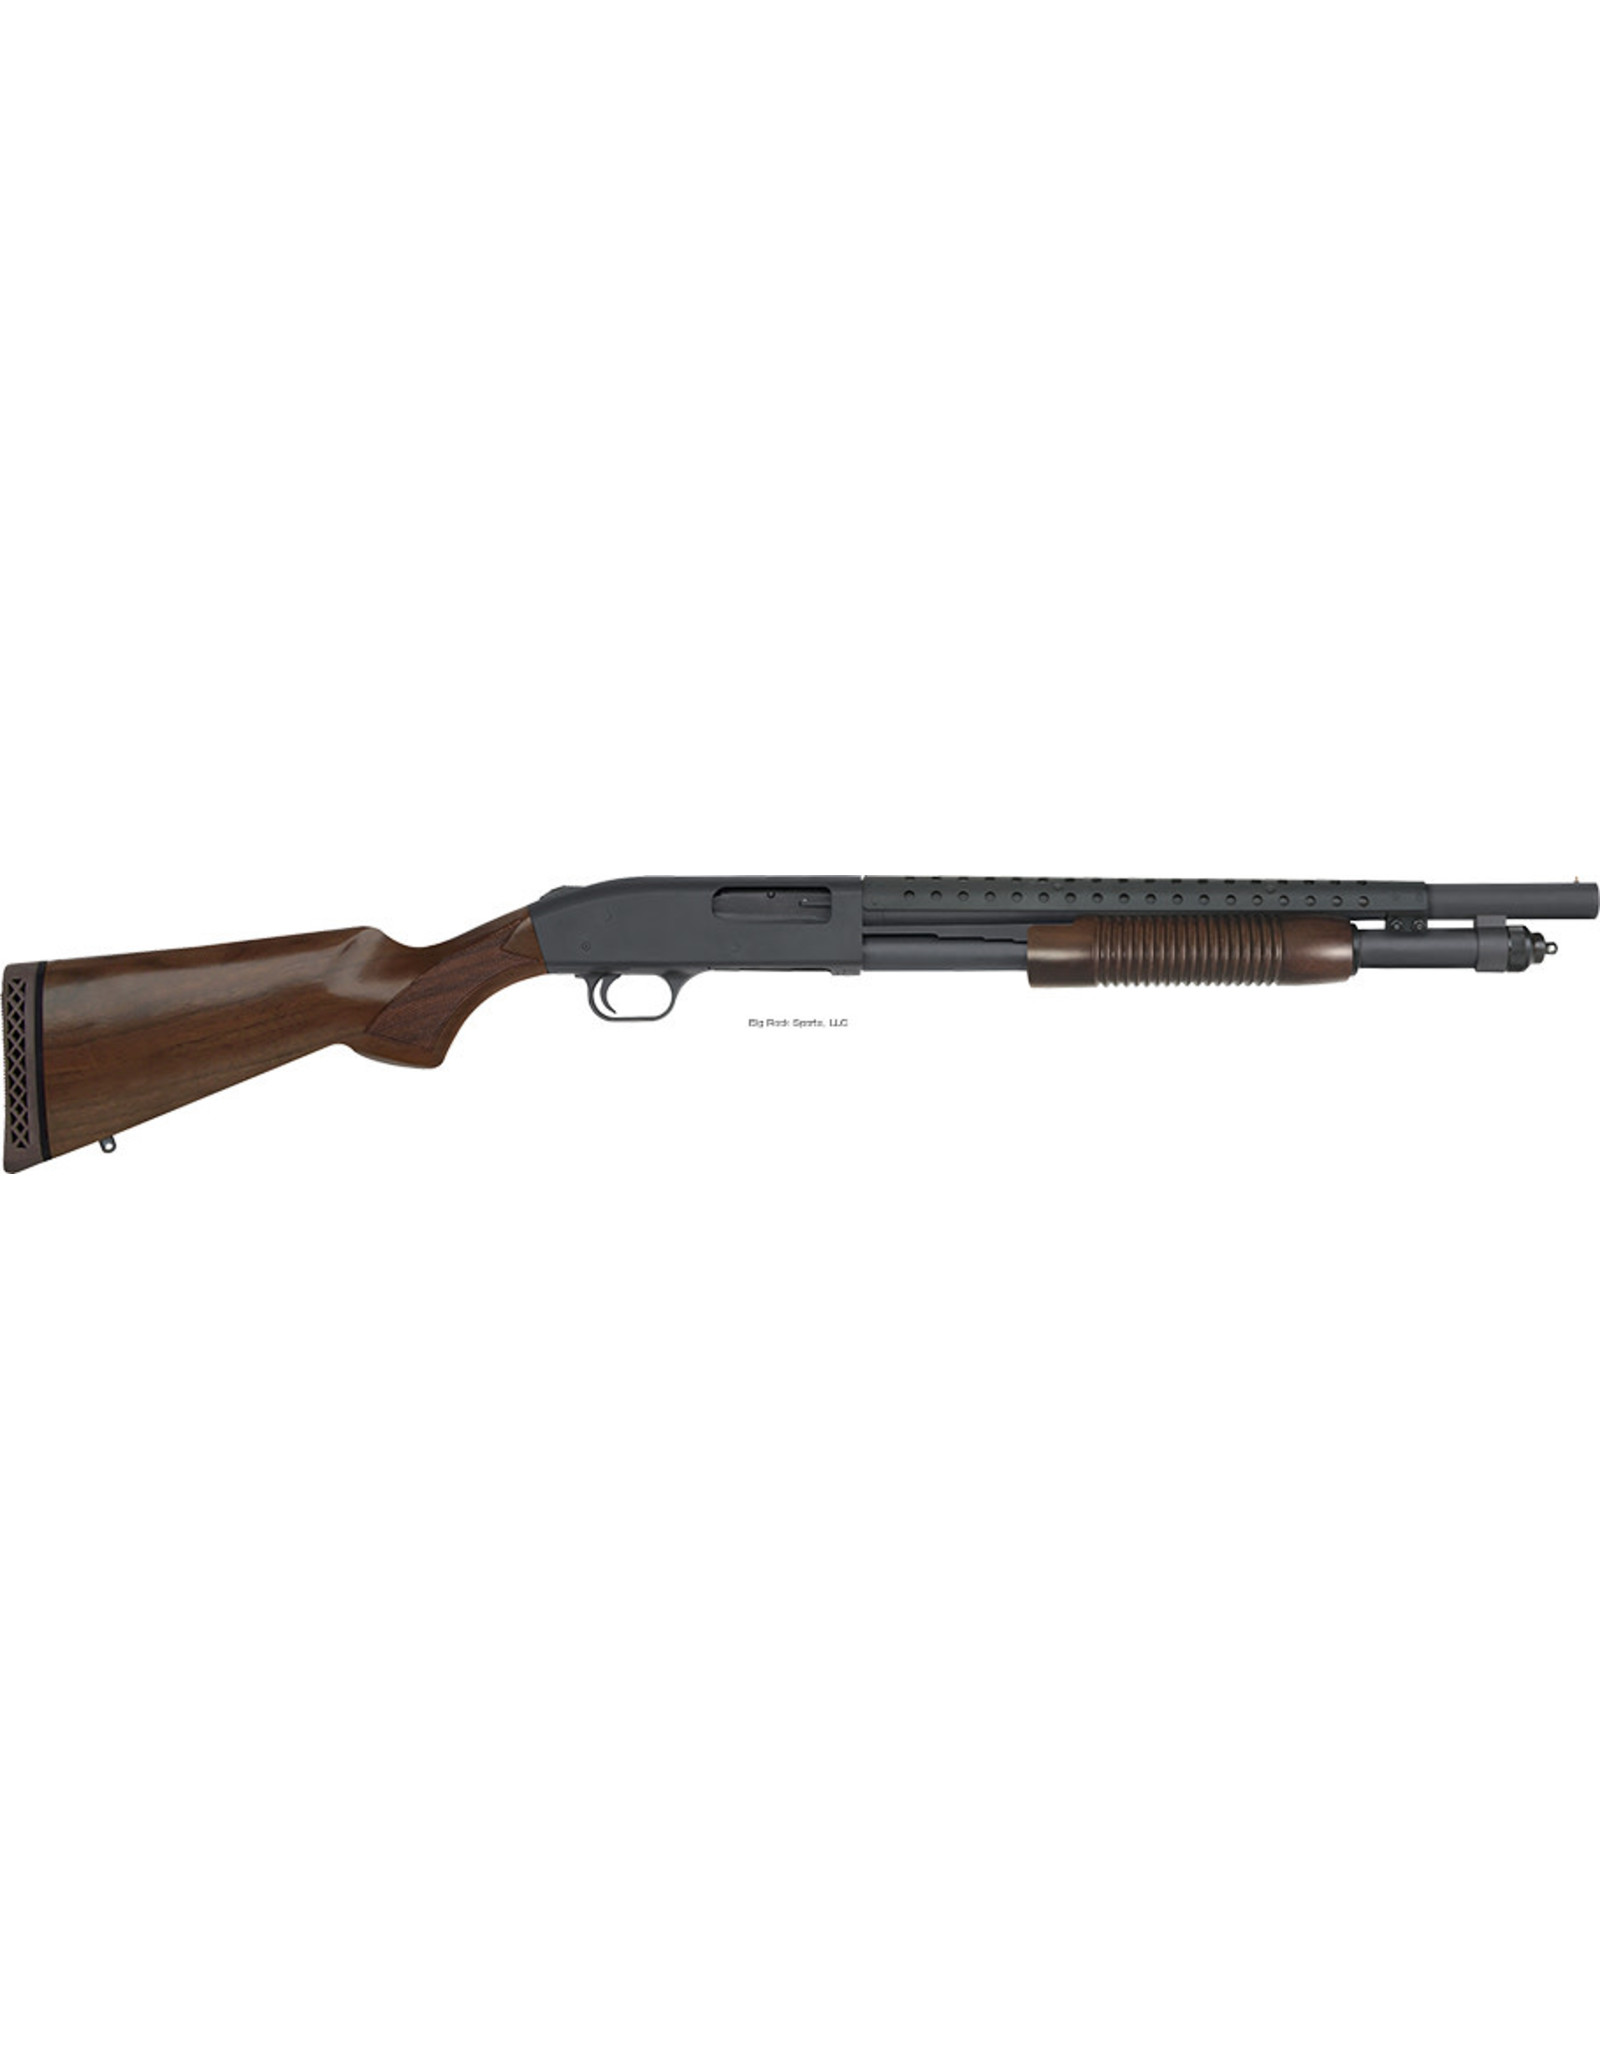 "Mossberg Mossberg 52151 590 Pump Shotgun, 12 GA, 18.5""Bbl, Retrograde, Walnut, Heatshield, Bead sight, 6+1 Rnd"